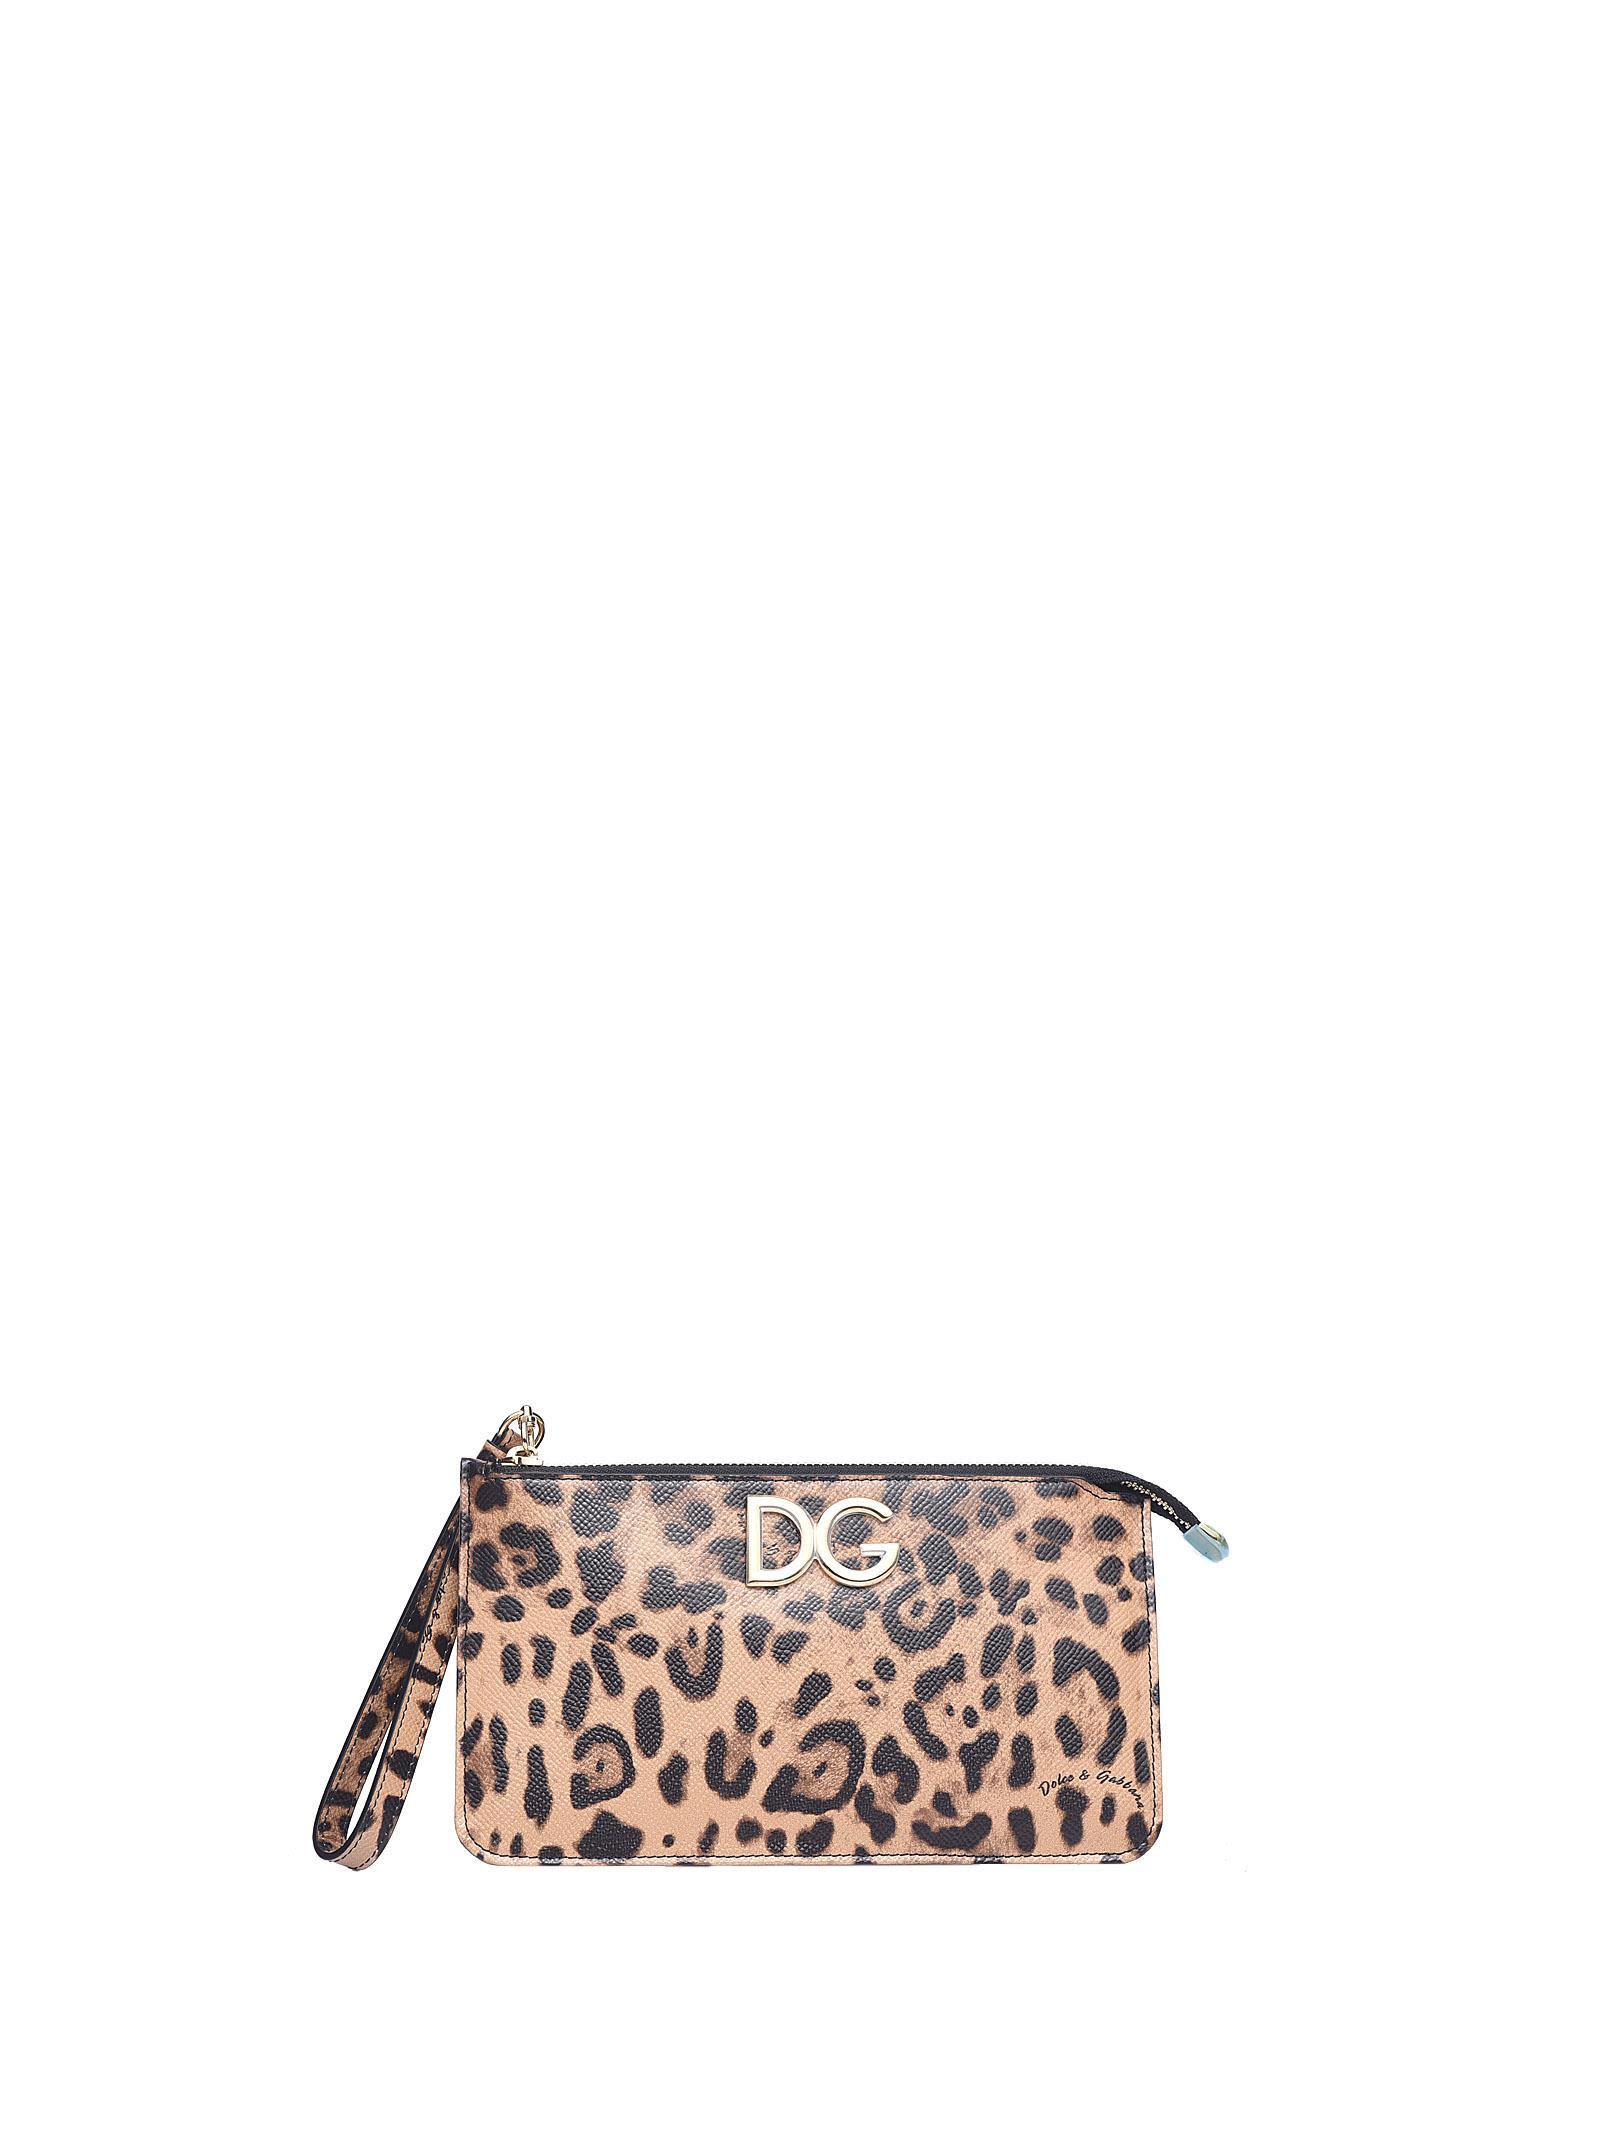 Dolce & gabbana Beauty Leopard